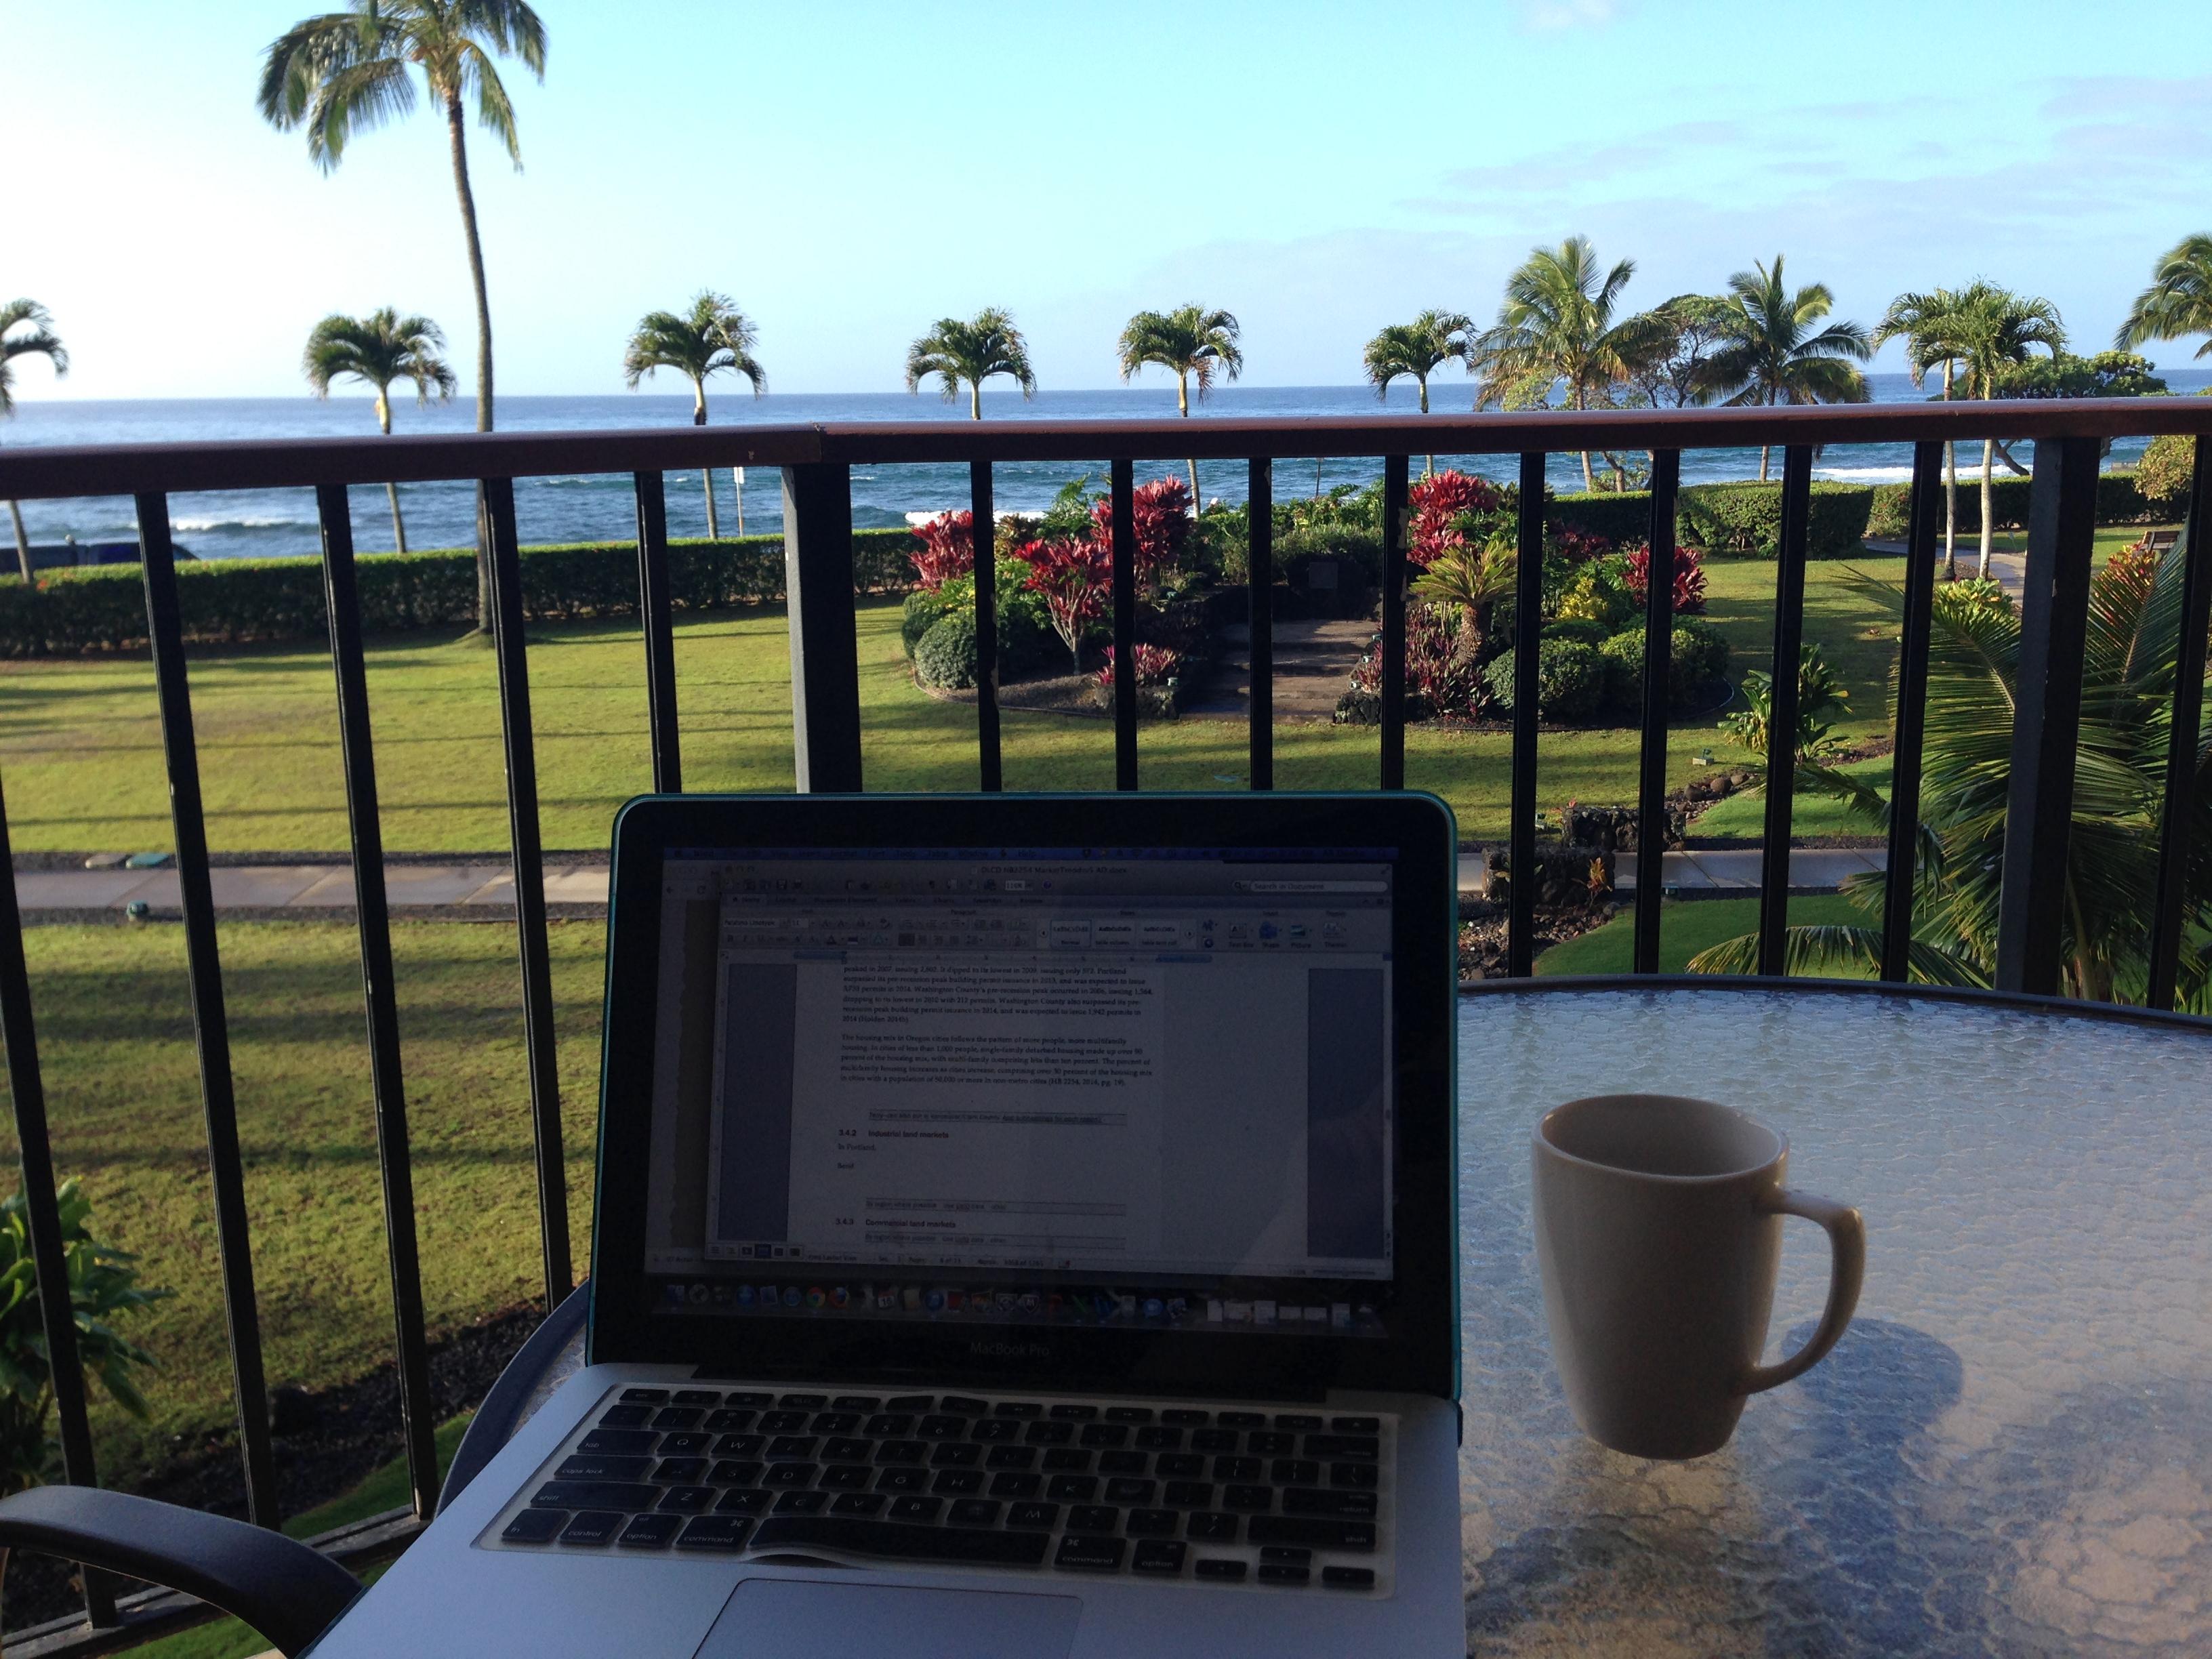 Alison Danko_ECONorthwest_Working Remotely from Kauai